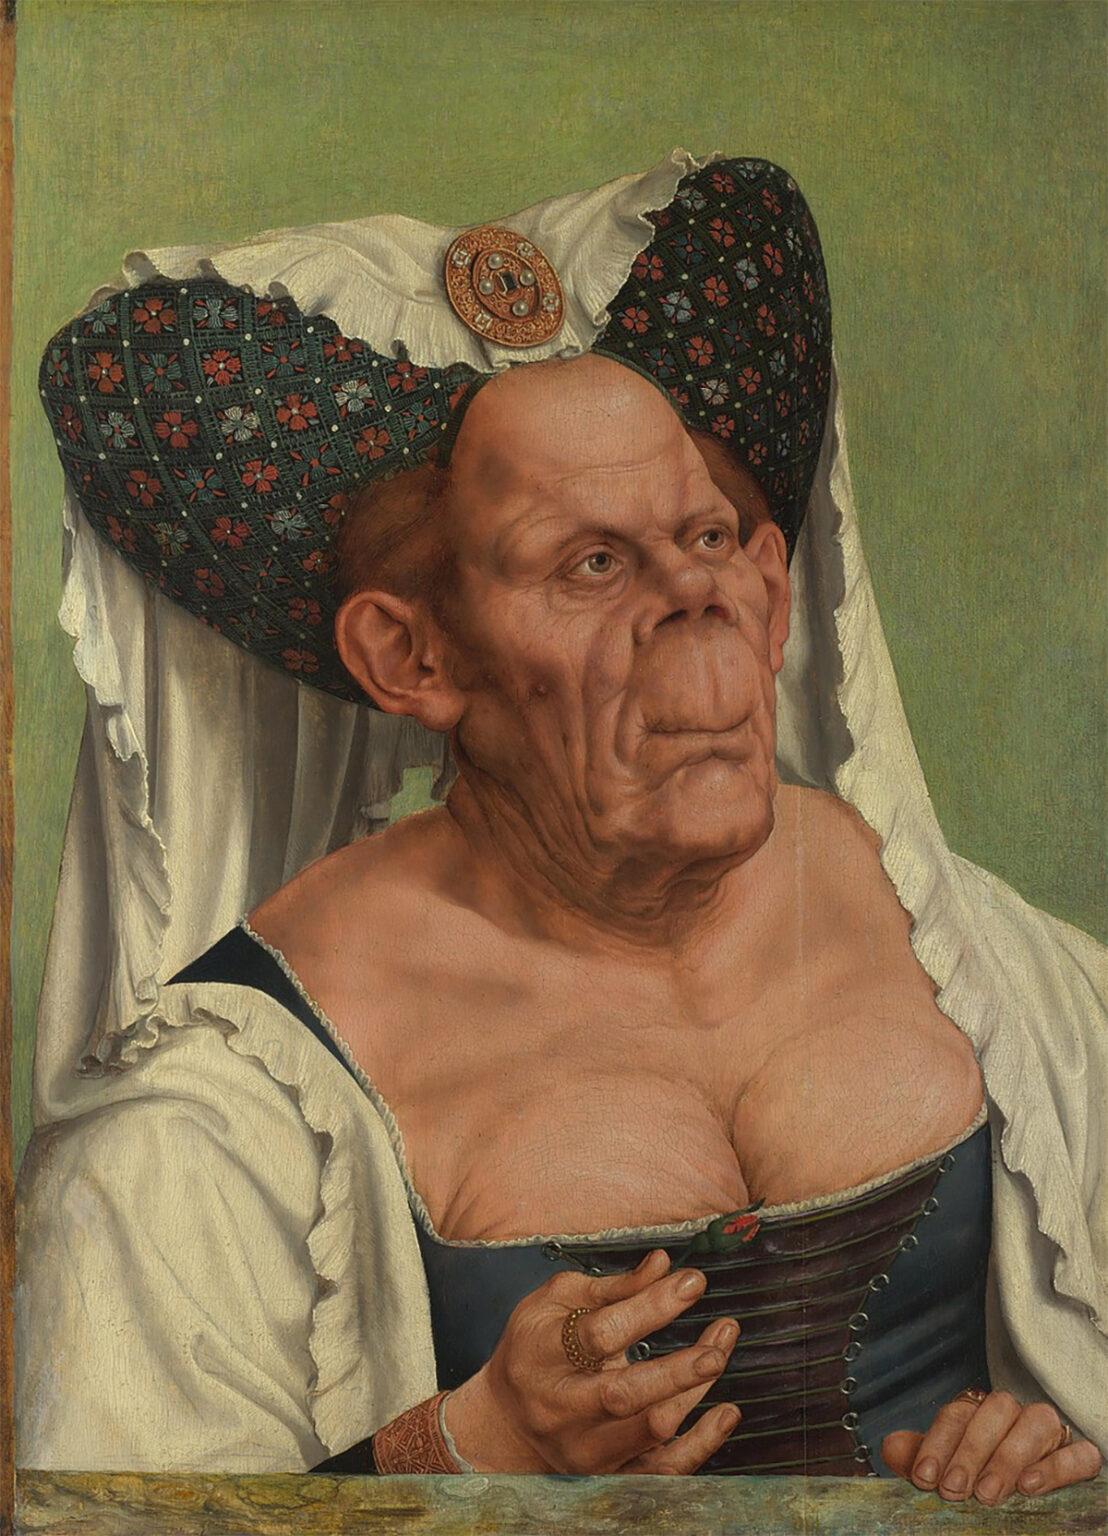 The Ugly Dutchess by Quentin Matsys, c. 1513. Matsys was an exception artist, and didn't paint the dutchess weird.